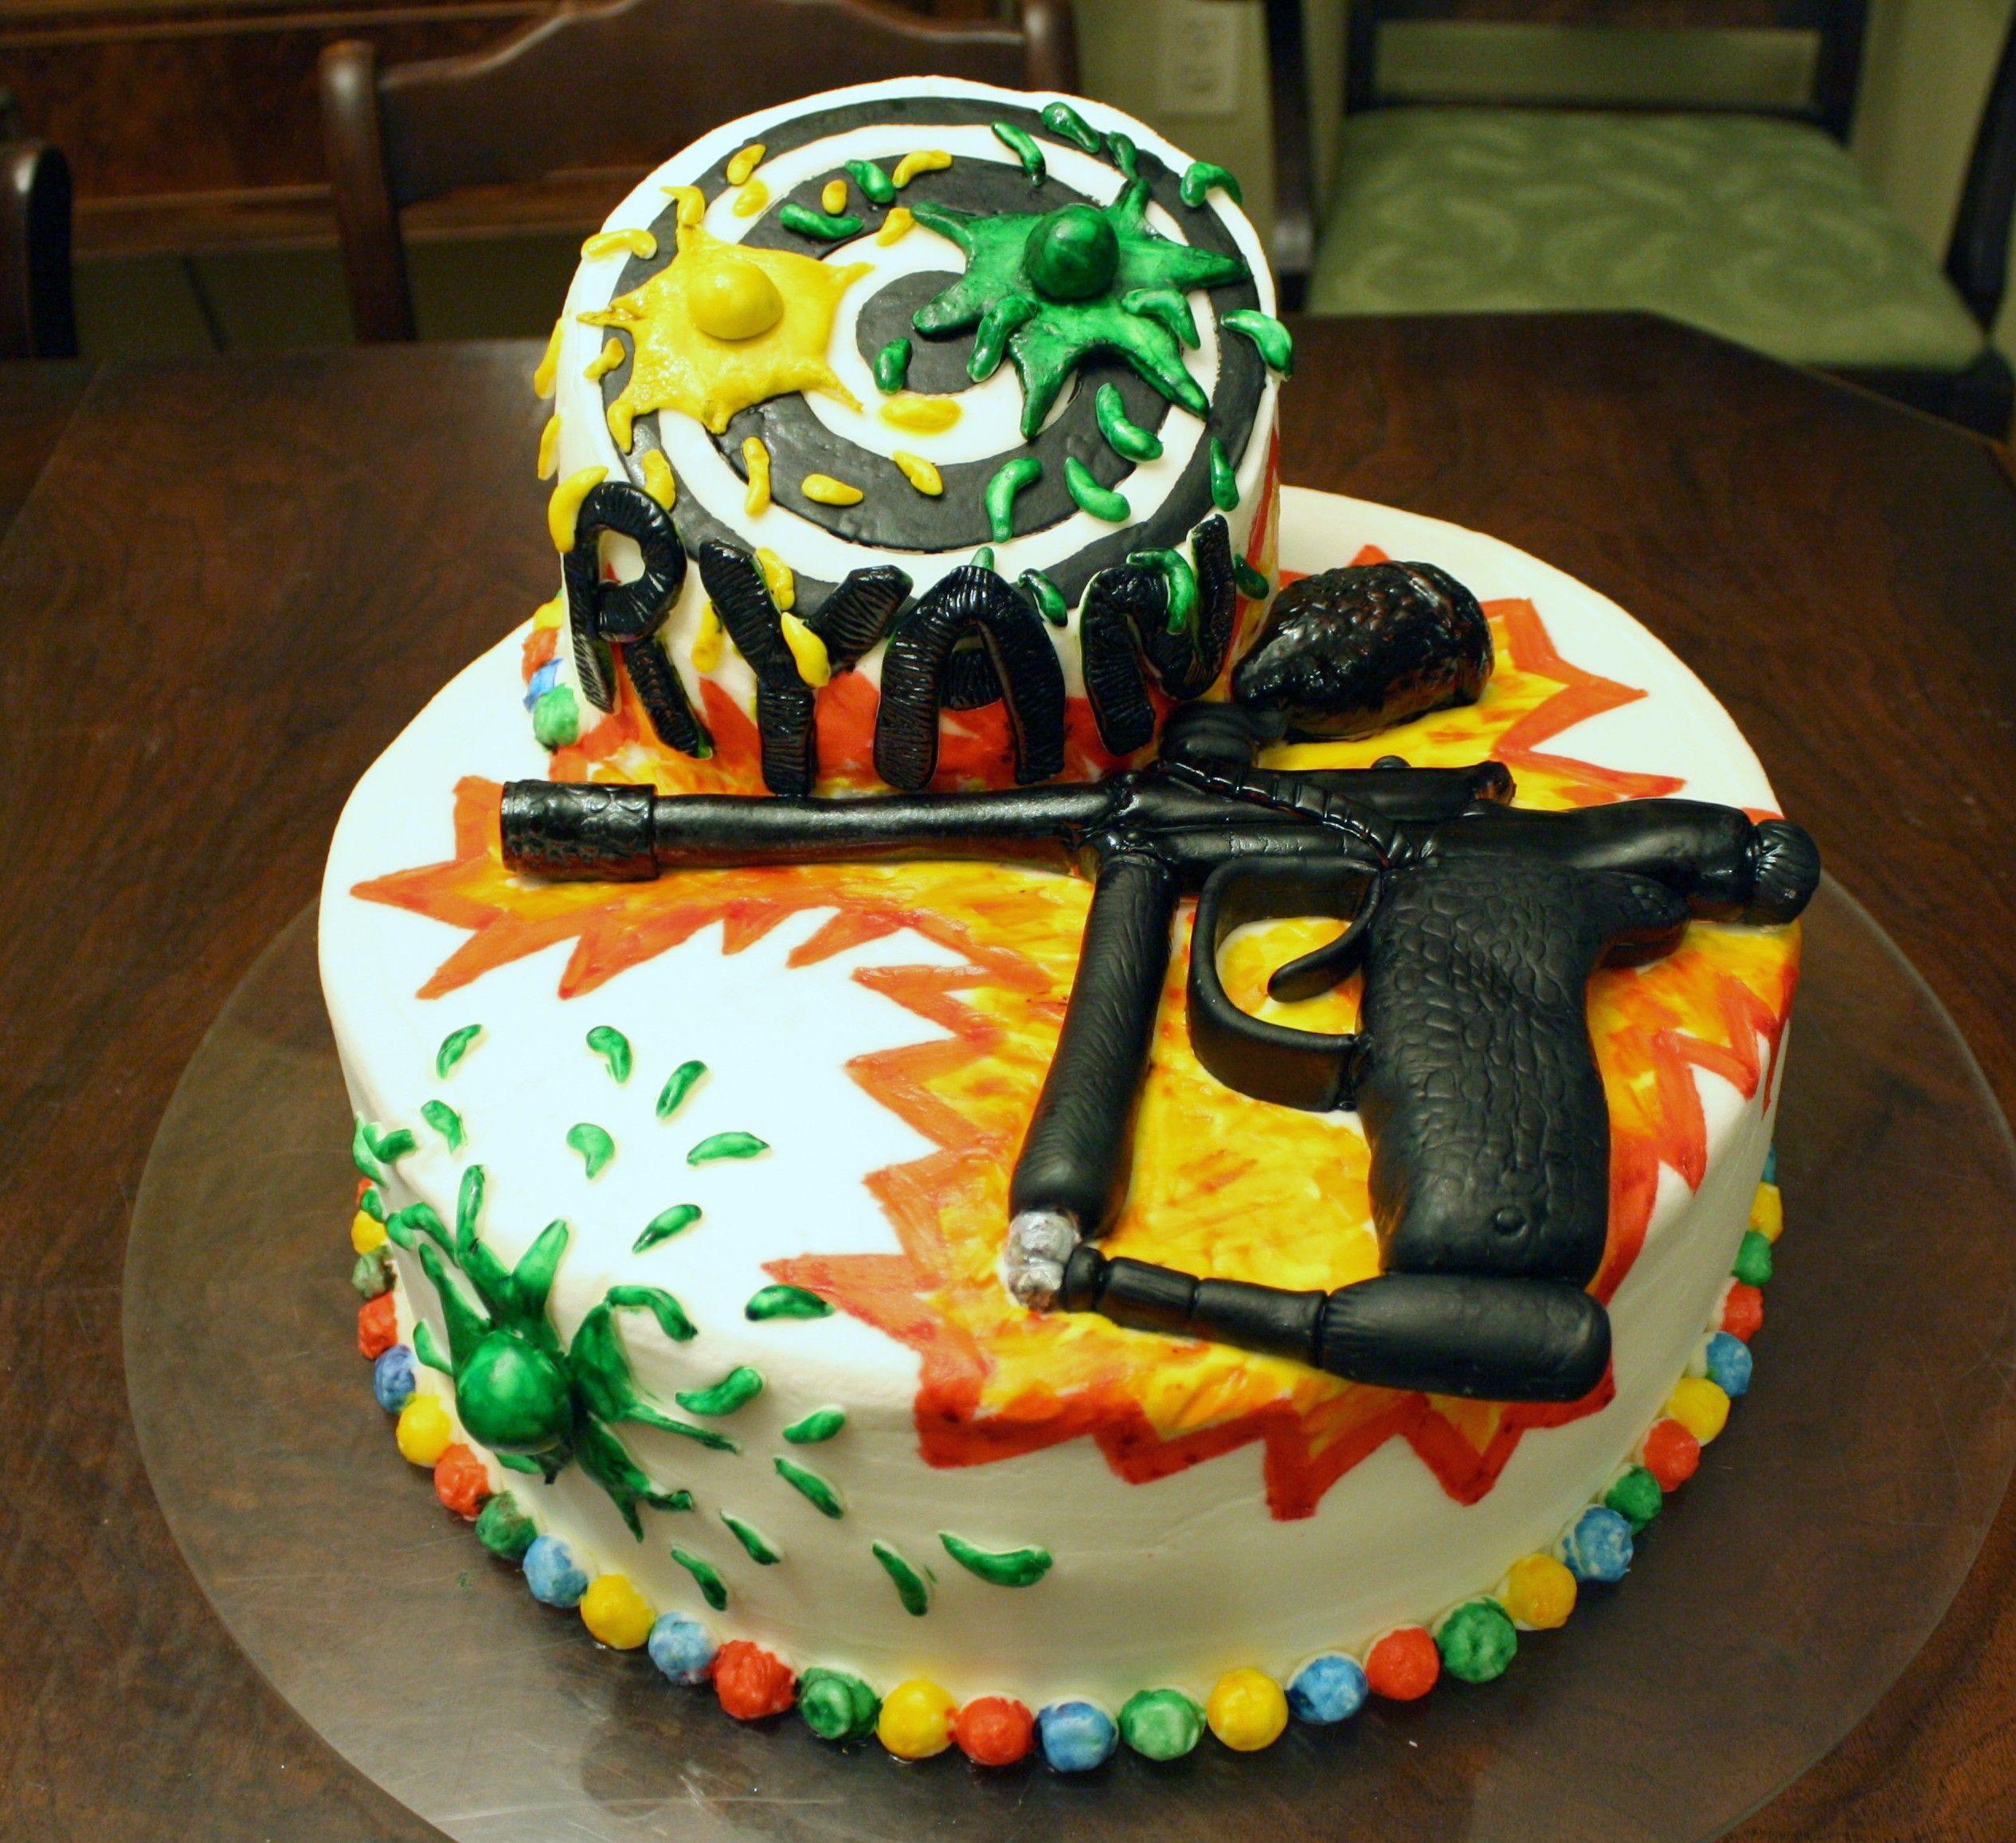 Paintball Birthday Paintball Target and Paintball Gun Birthday